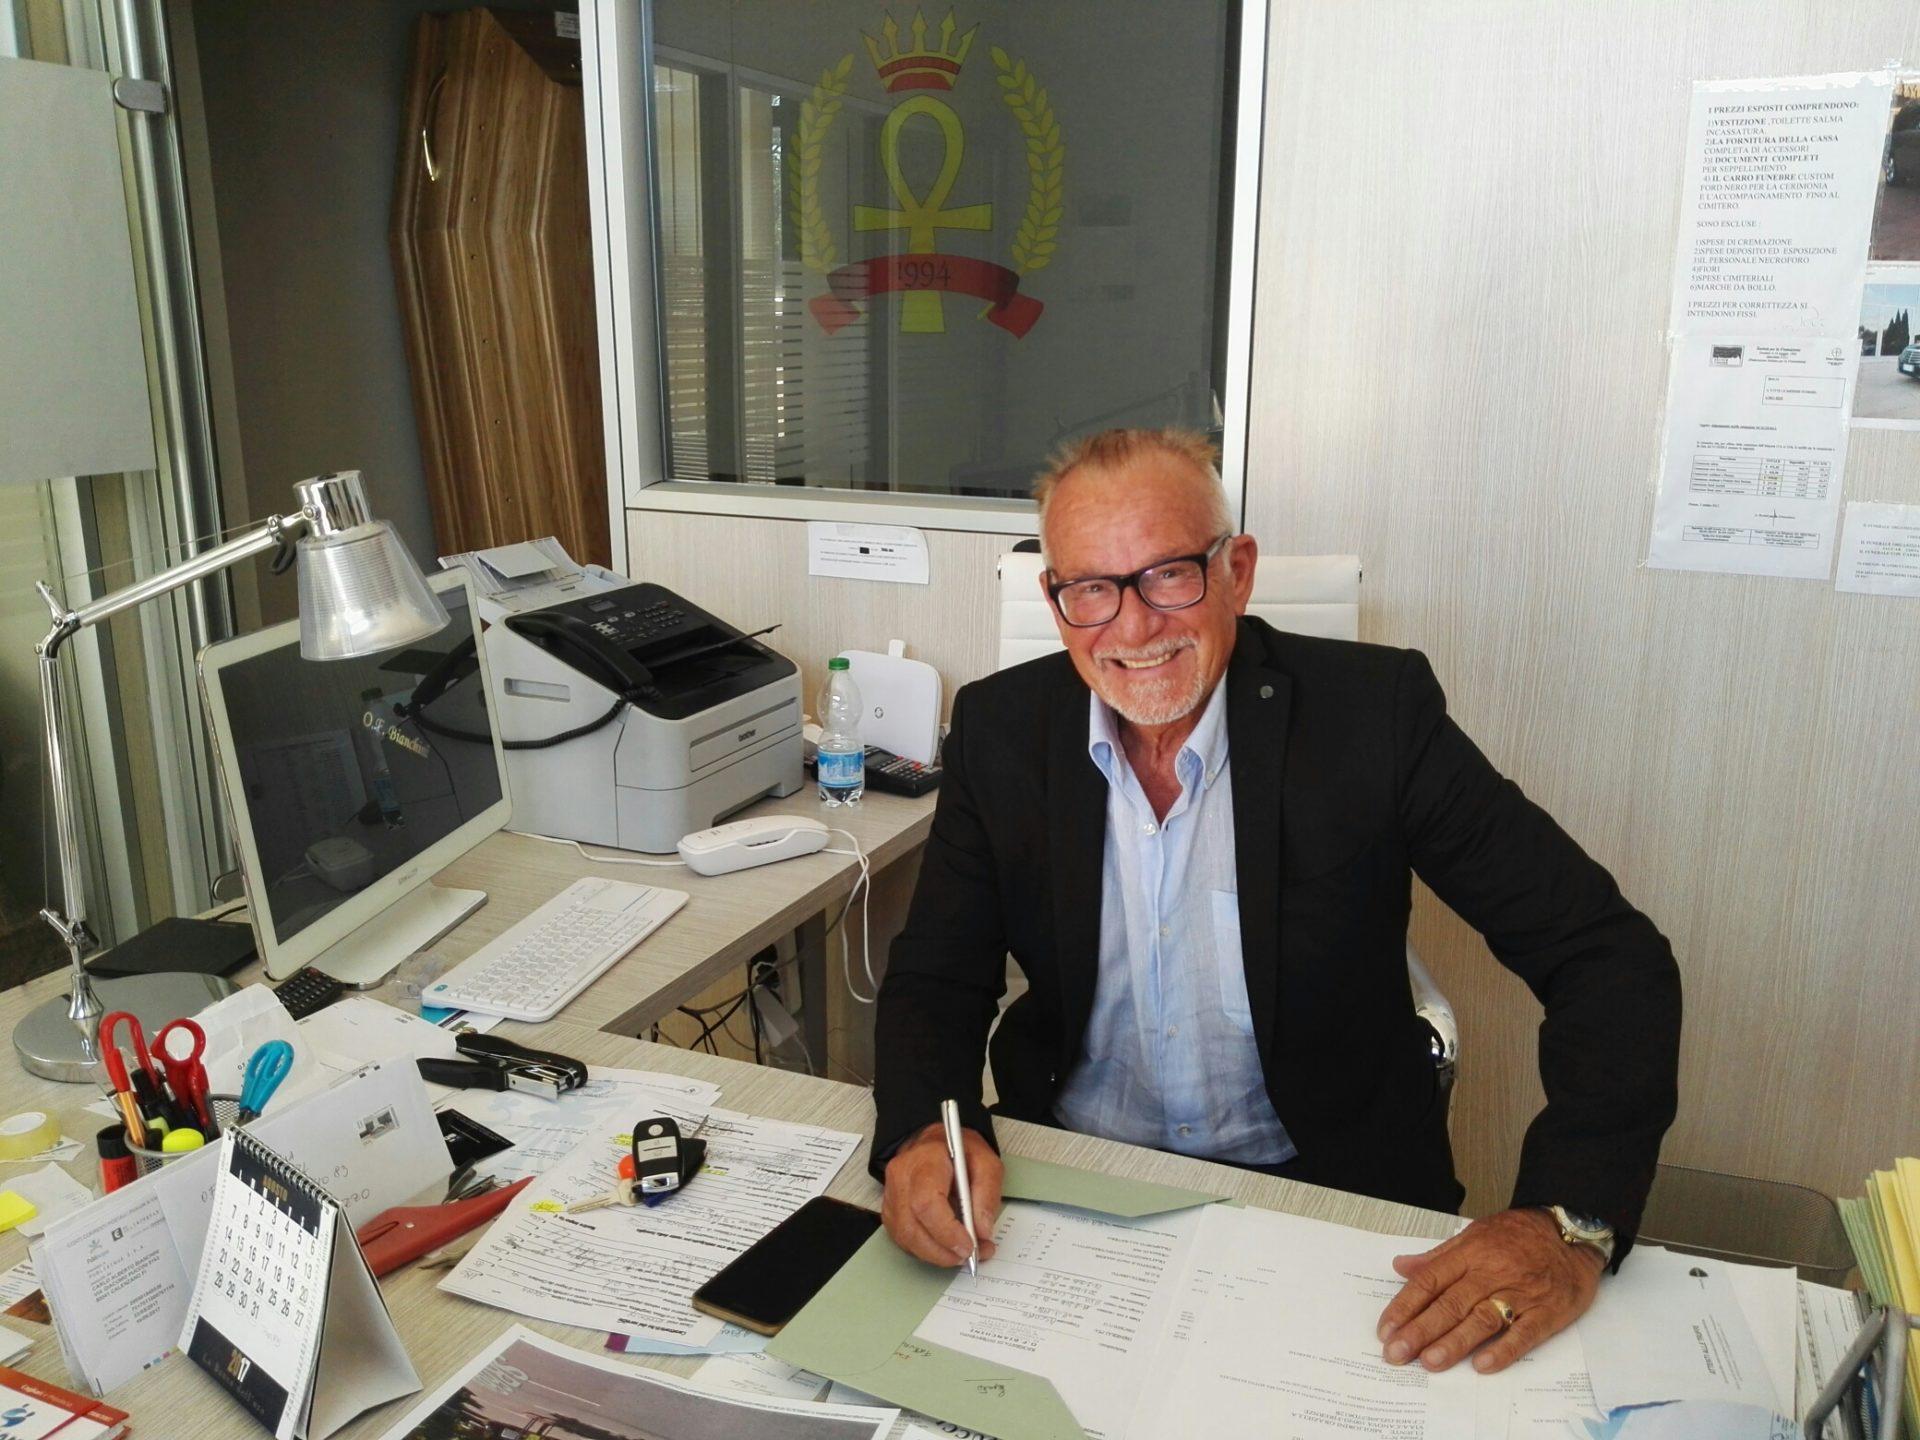 Onoranze funebri Bianchini